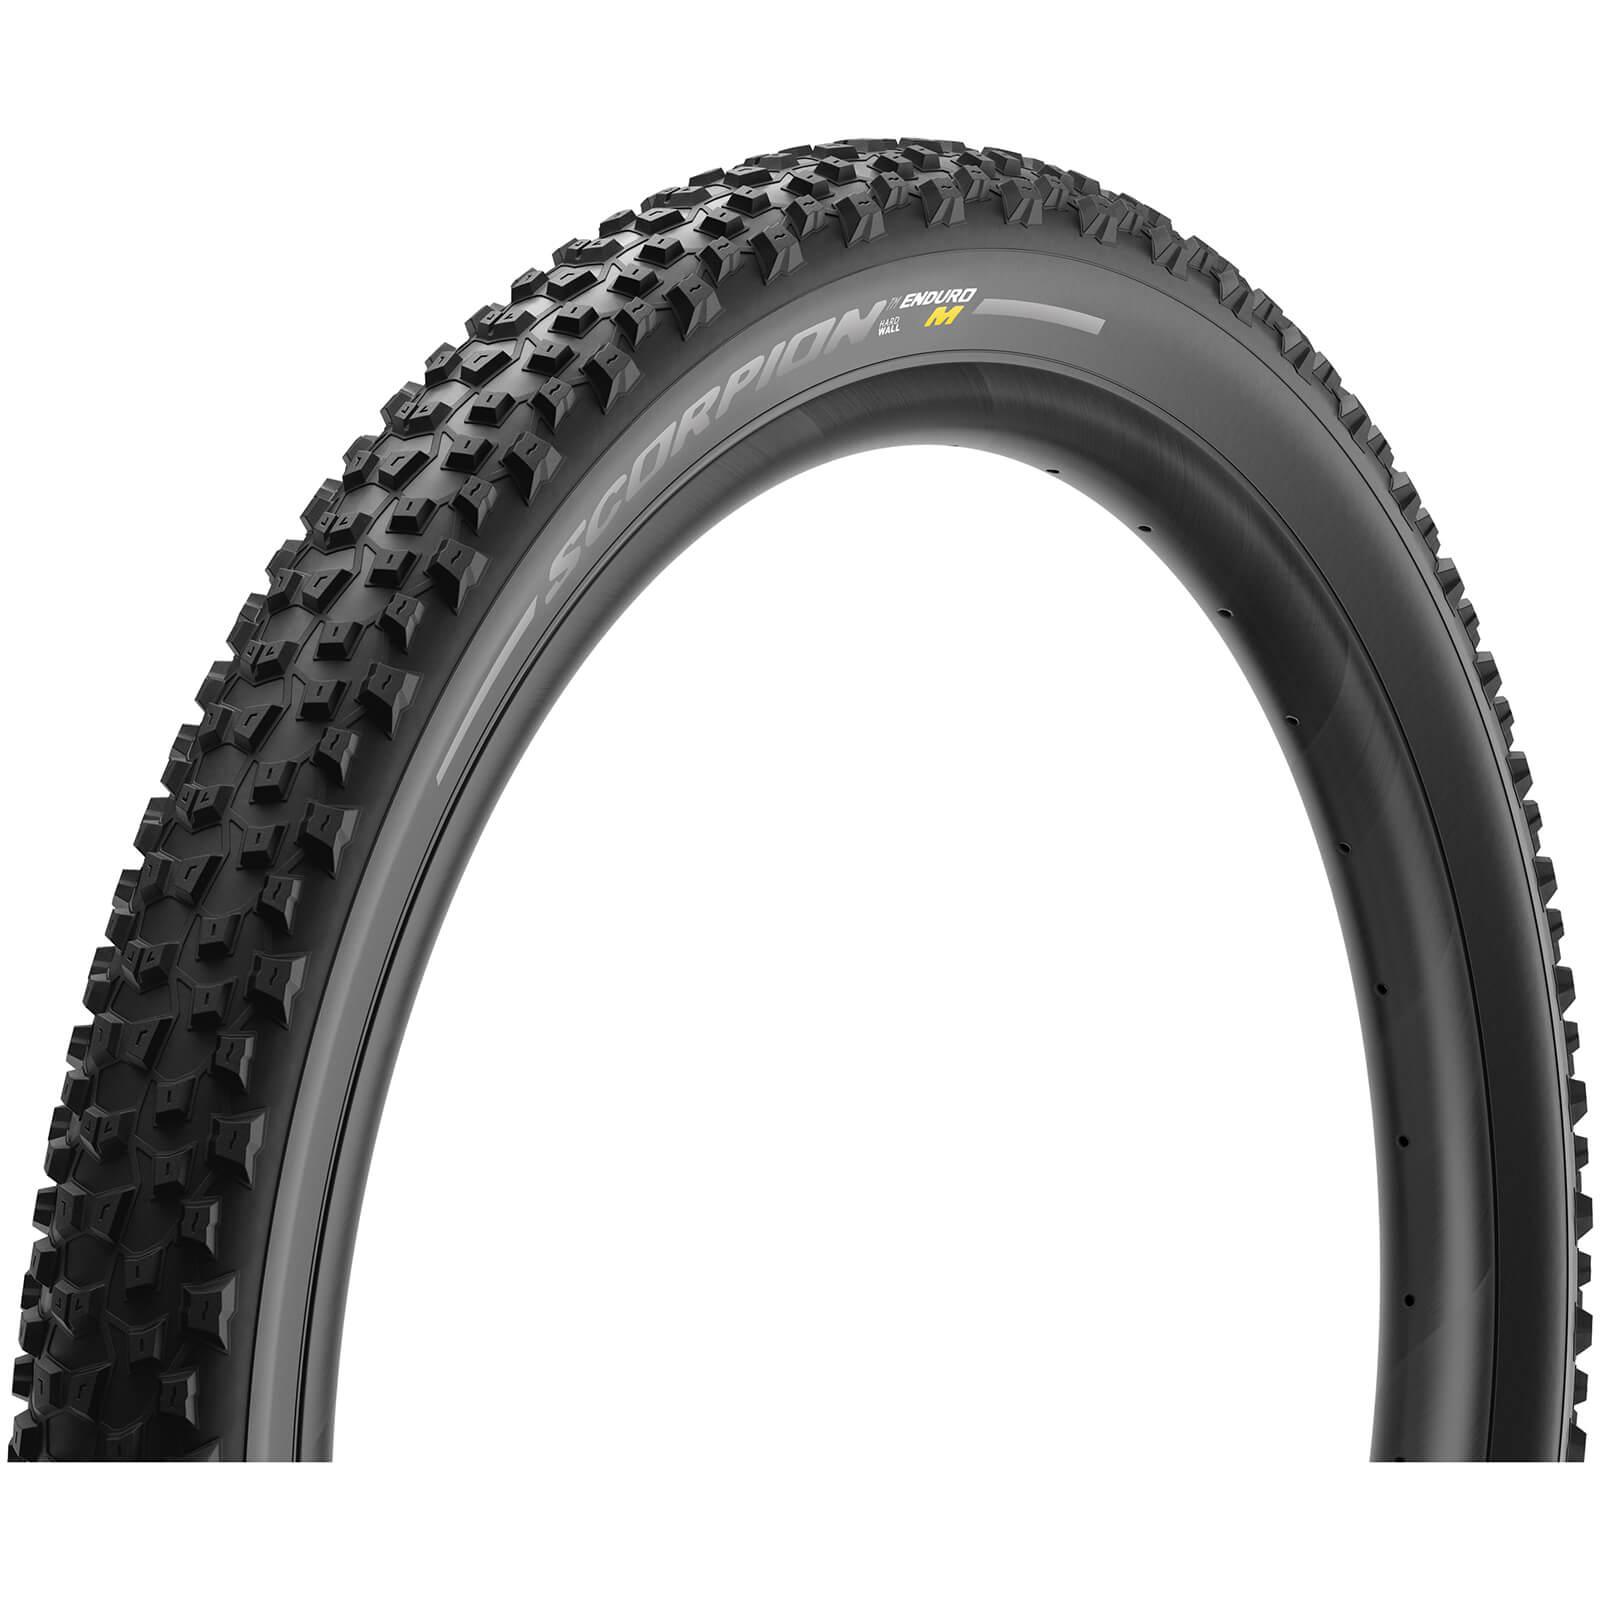 Pirelli Scorpion™ Enduro M MTB Tyre - 2.6In